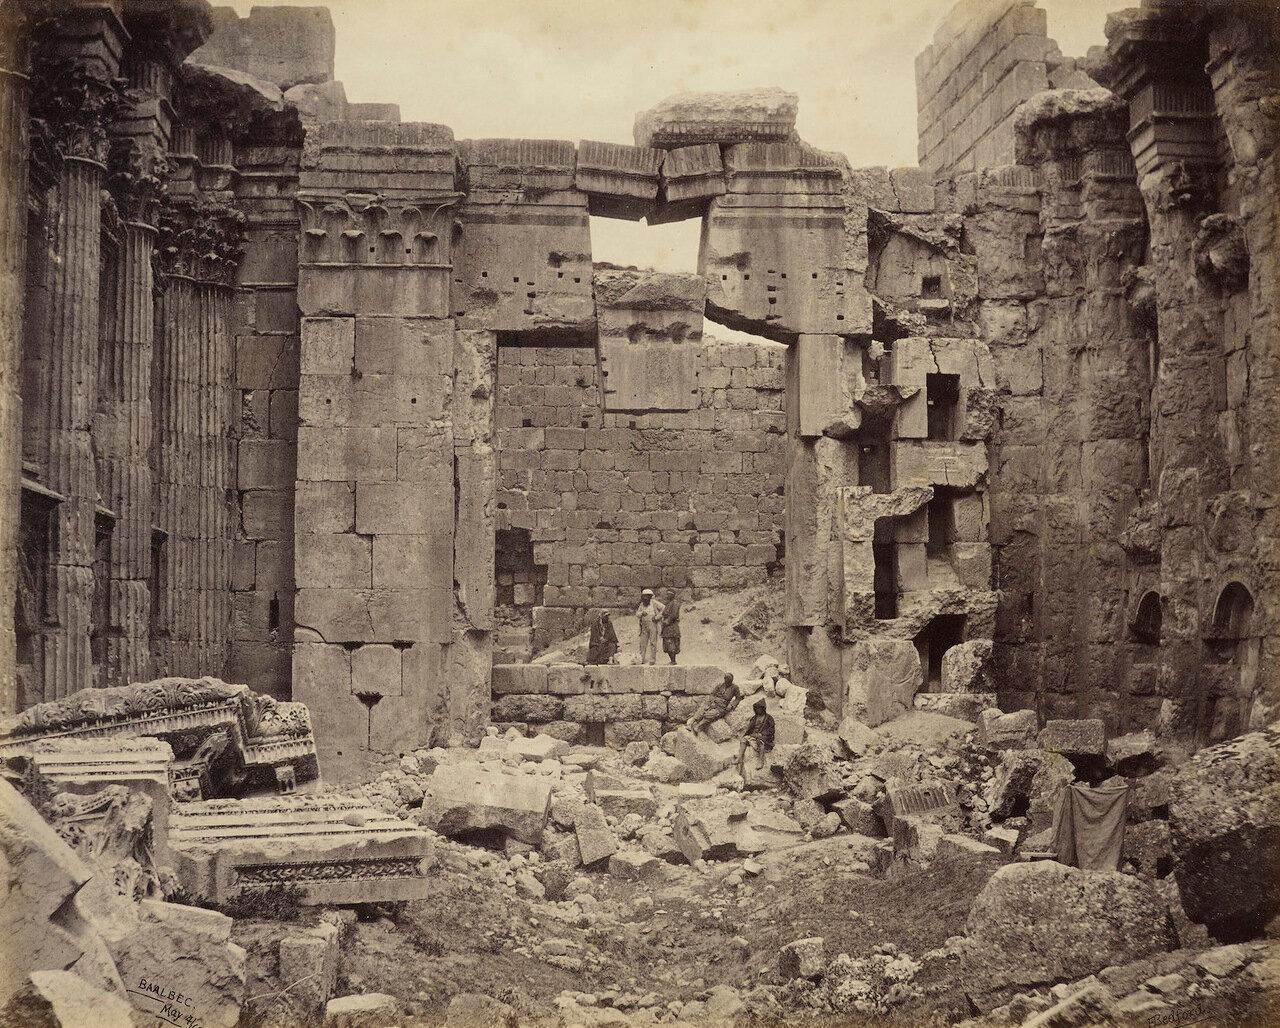 4 мая 1862. Внутренний вид храма Бахуса, Баальбек